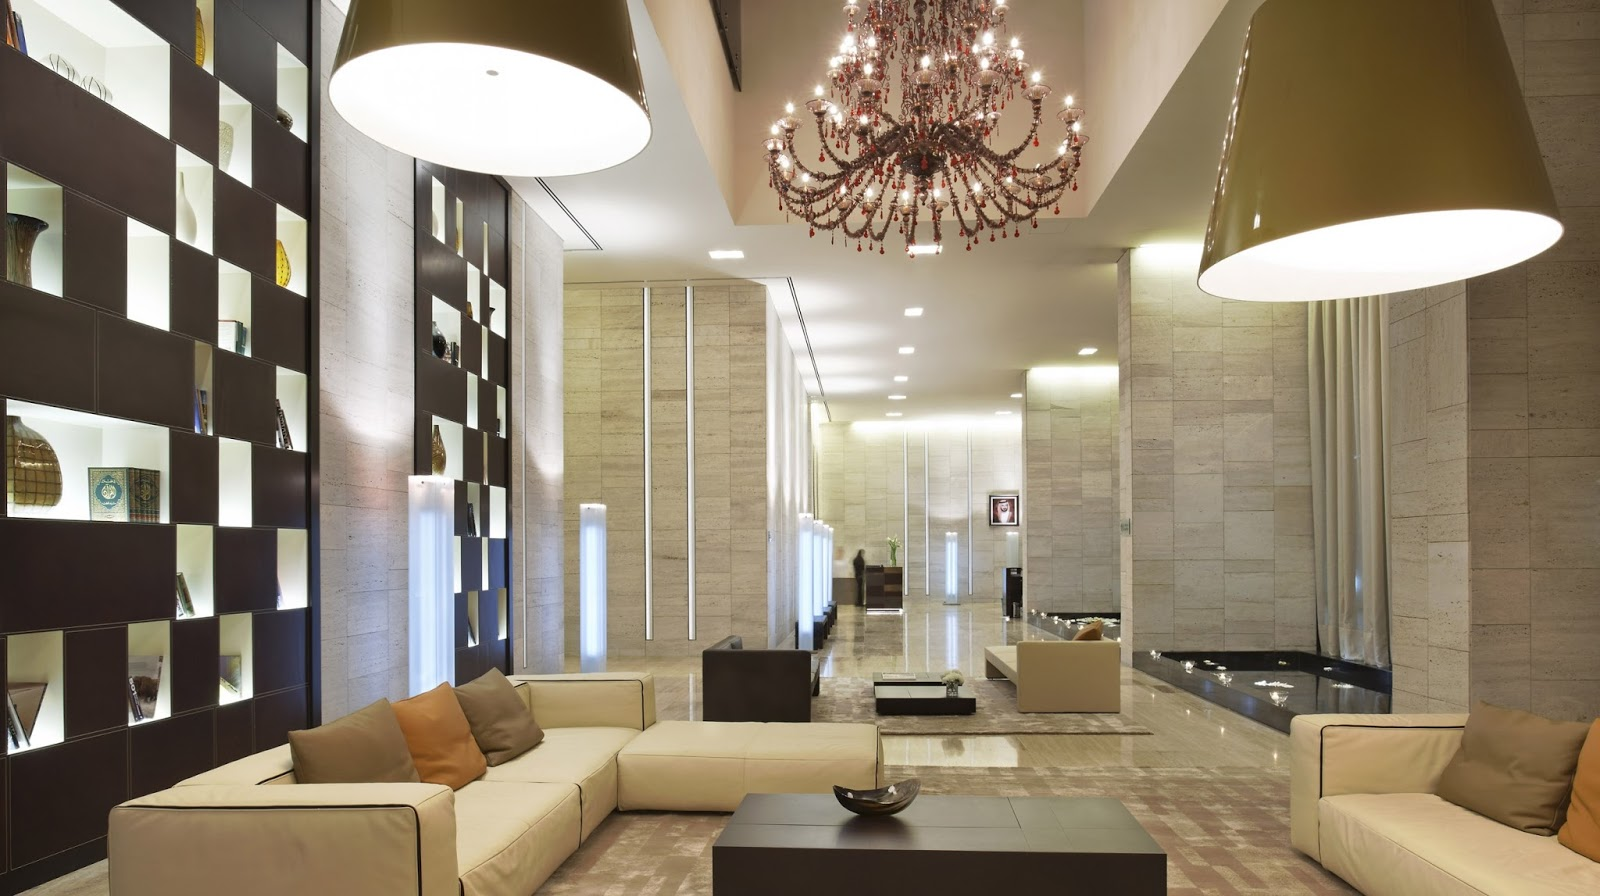 Interior design firms interesting 2015 top 100 giants for Top 100 interior design firms in singapore